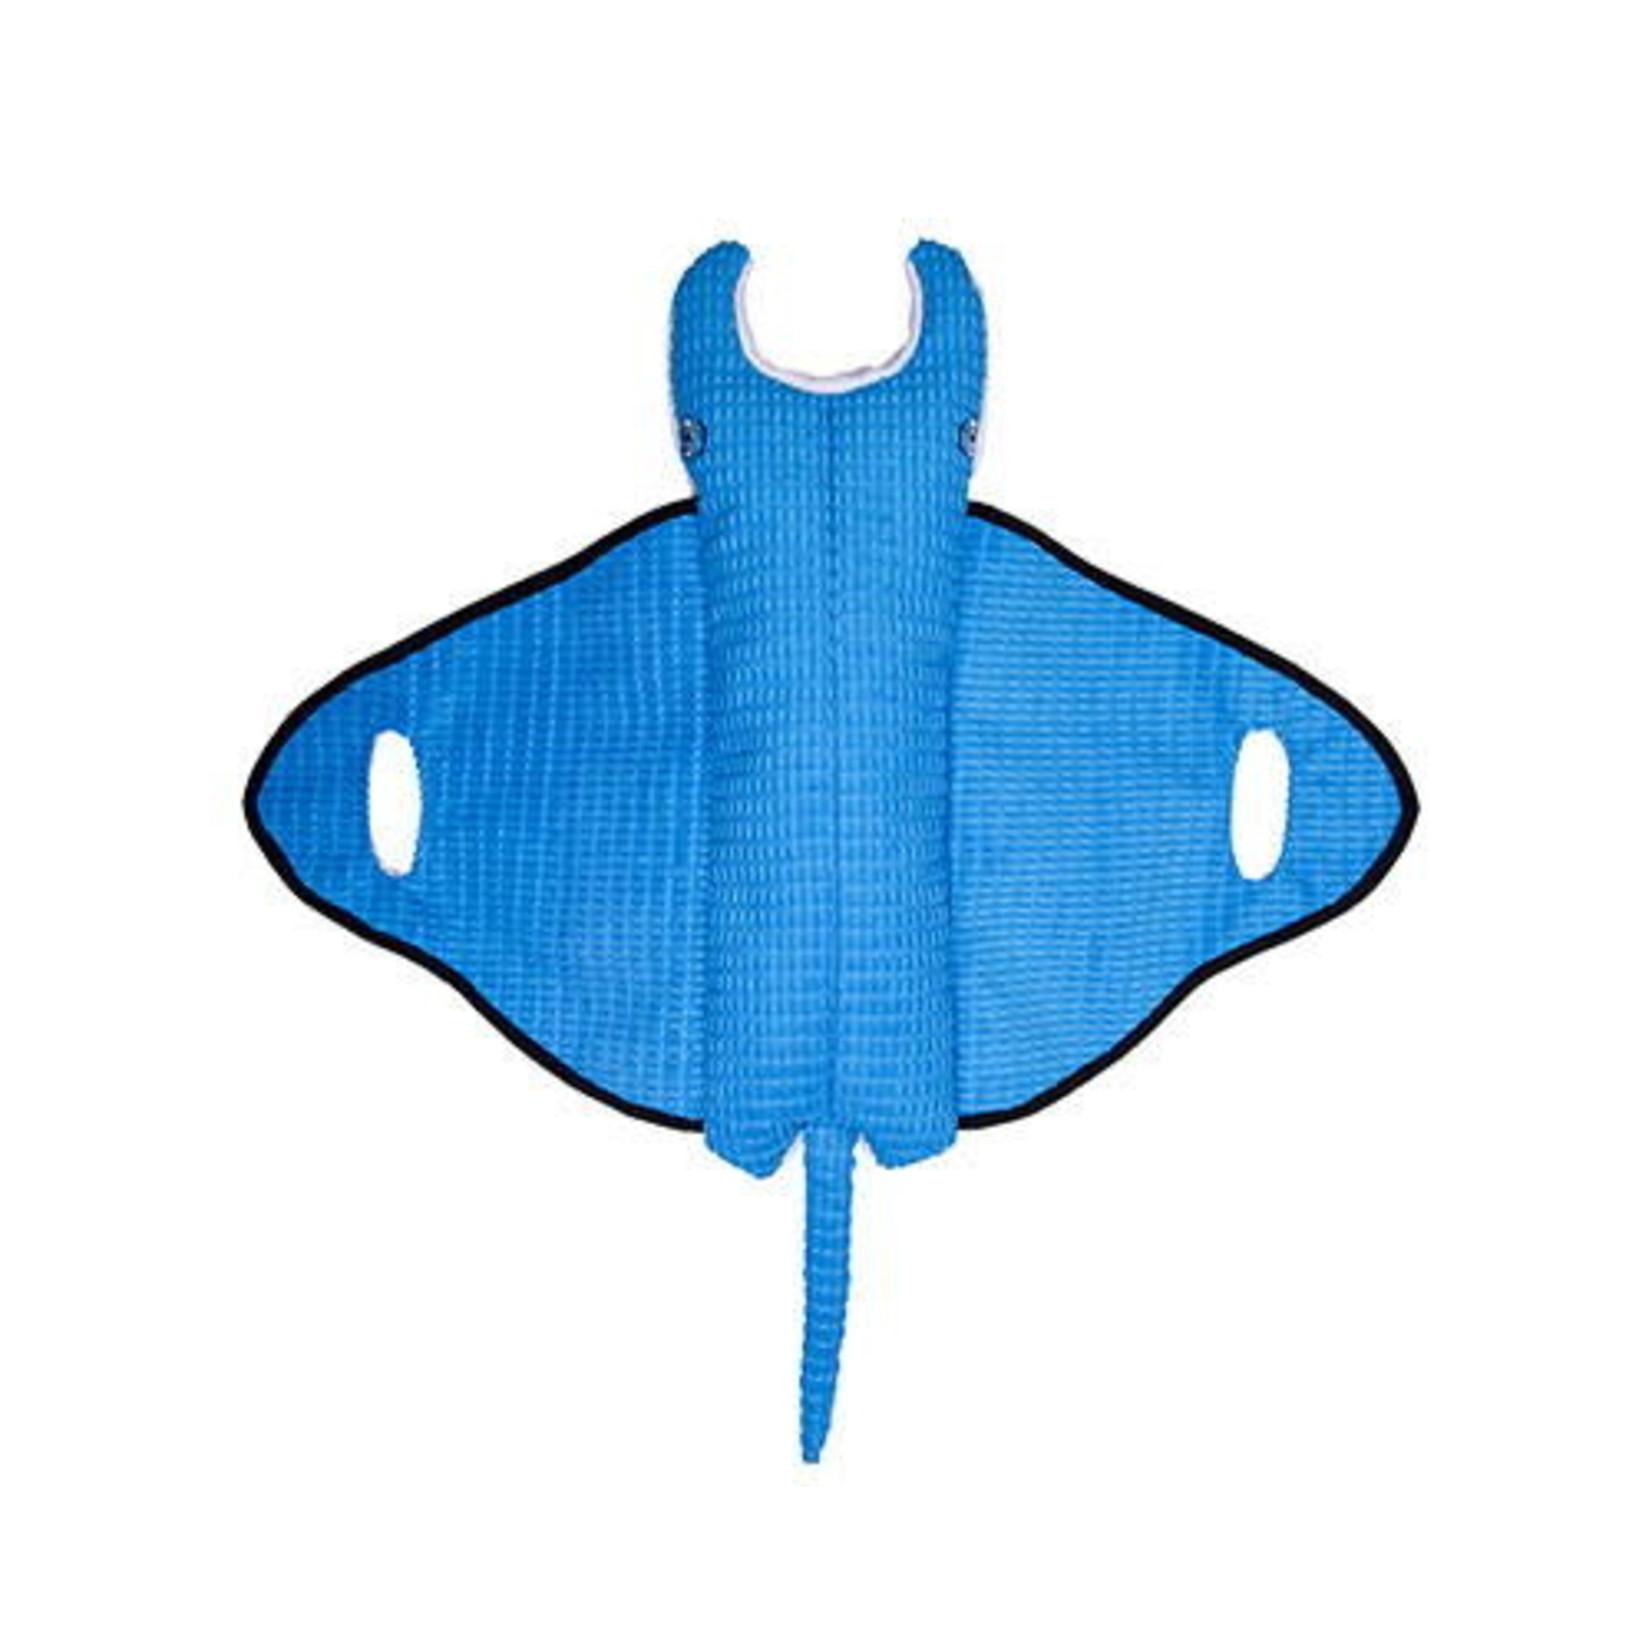 Tender tuffs Manta Ray Tug toy